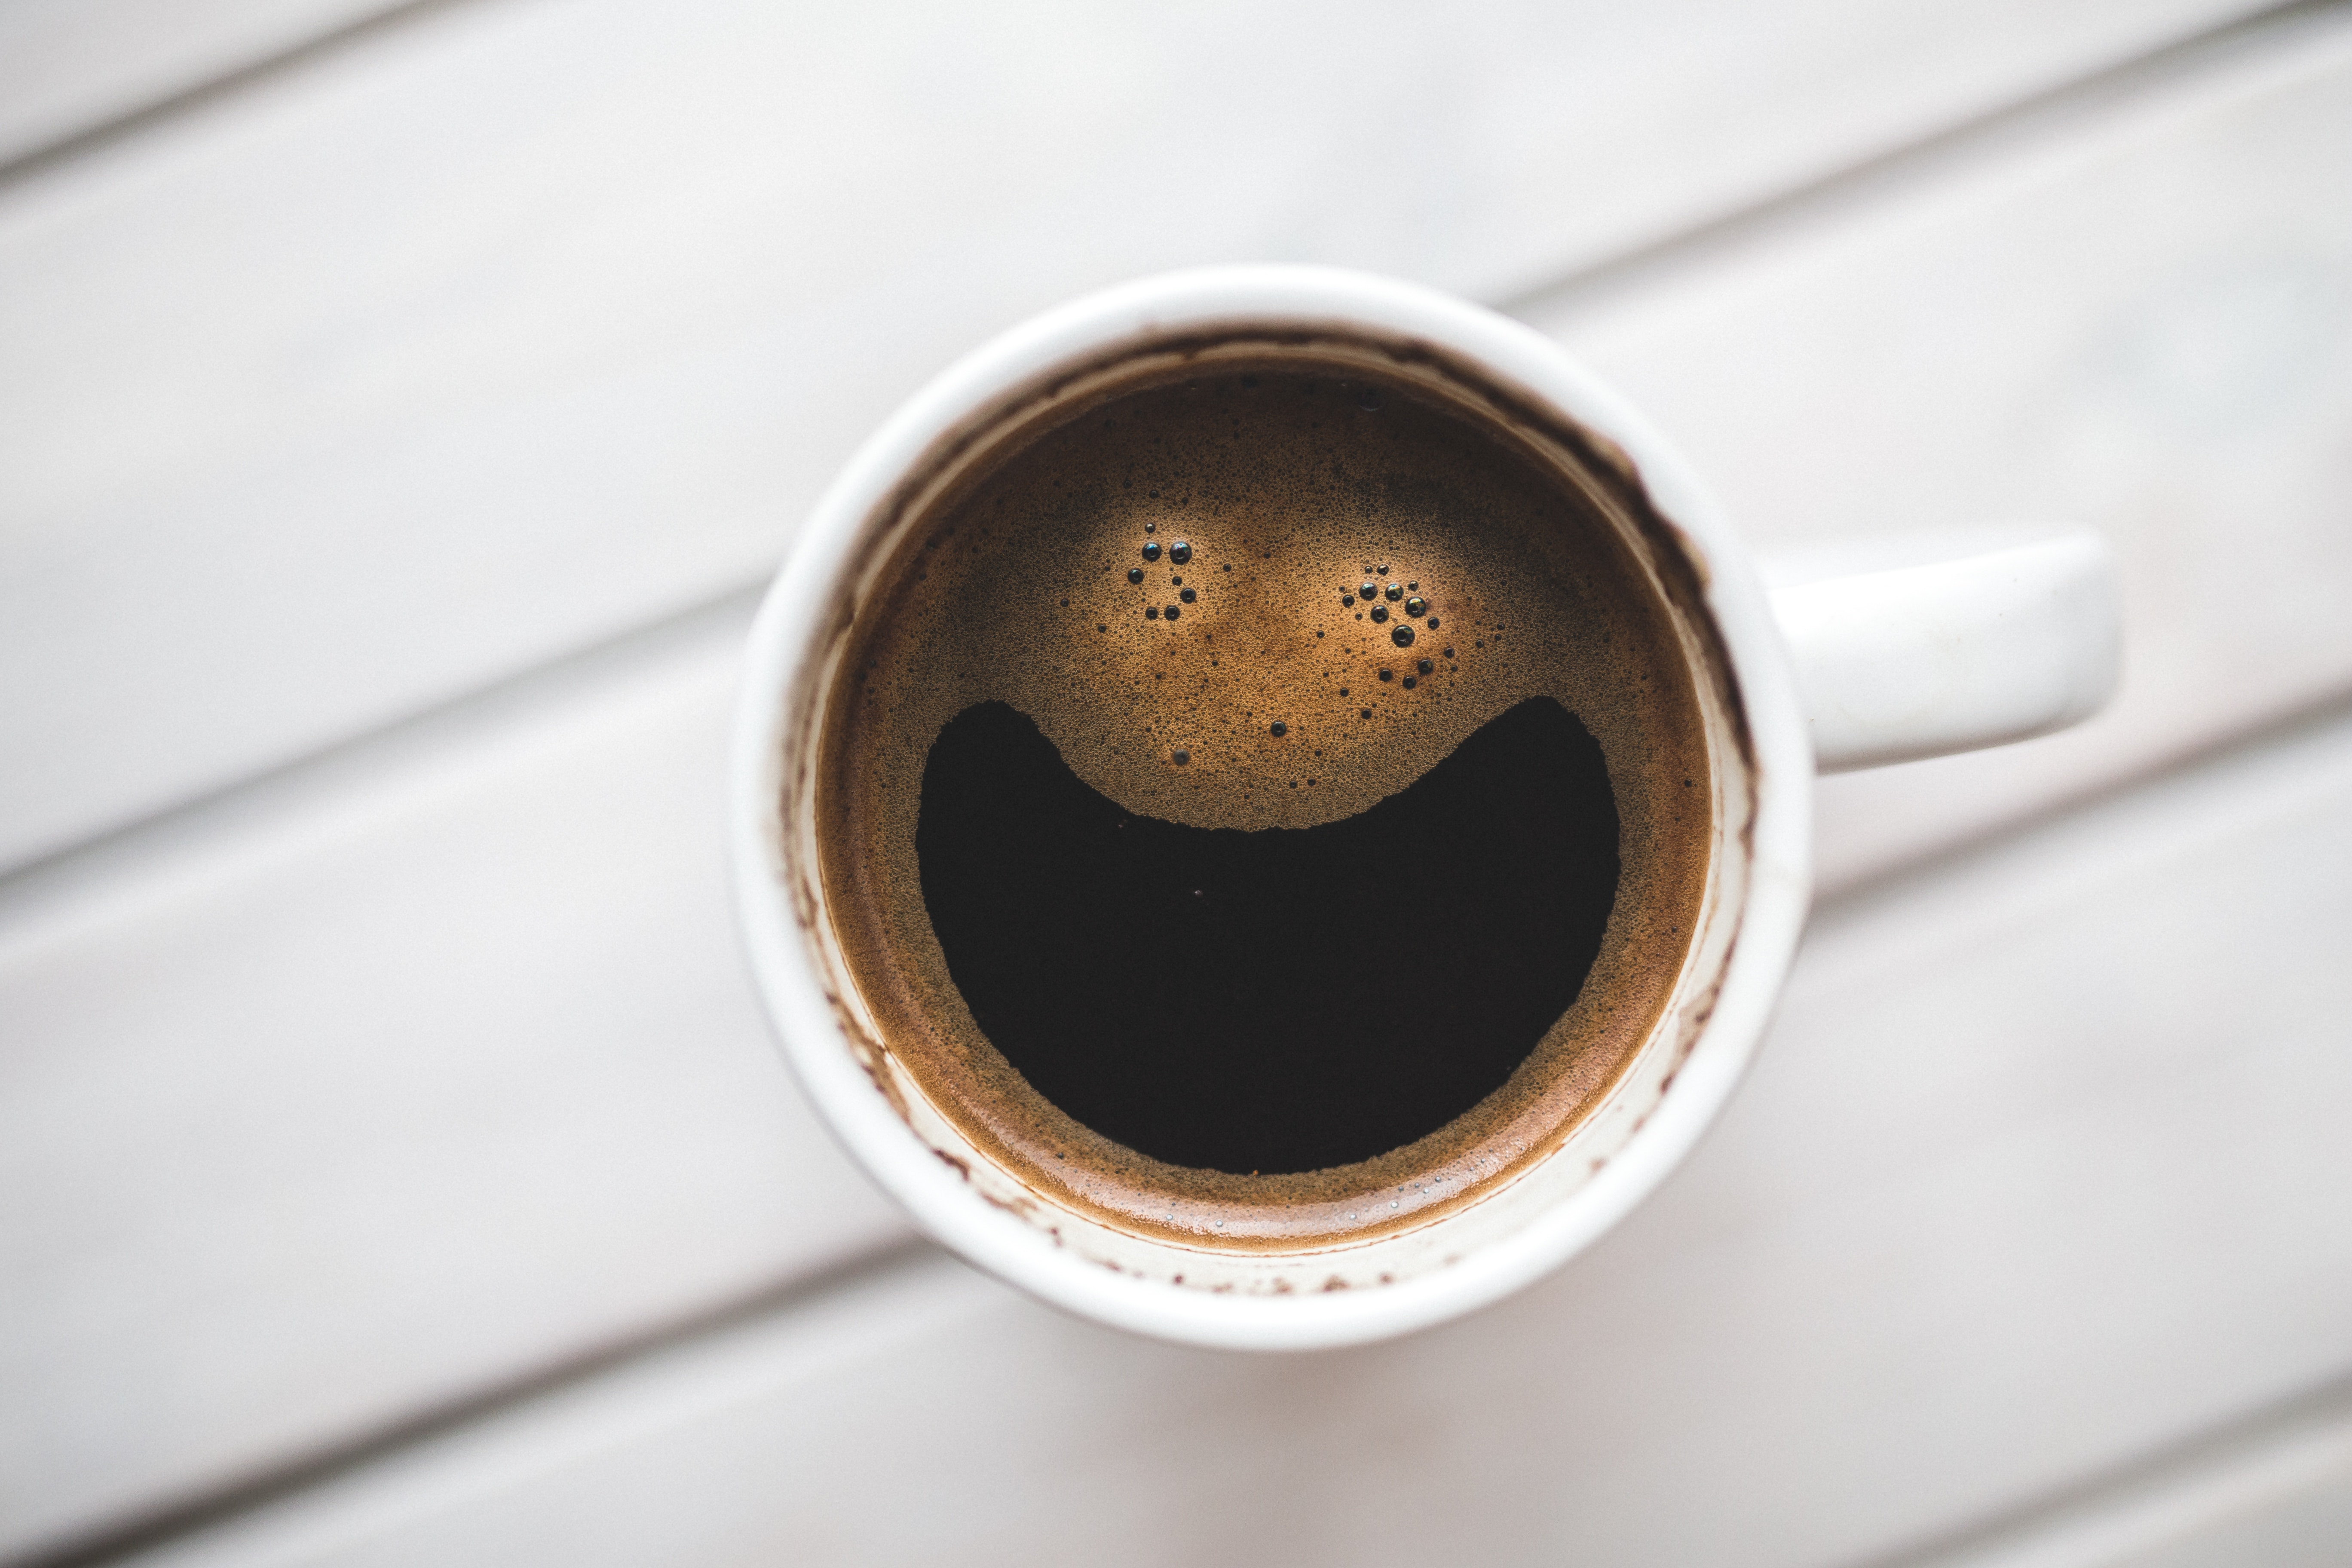 Kopje koffie drinken met PensioenVos